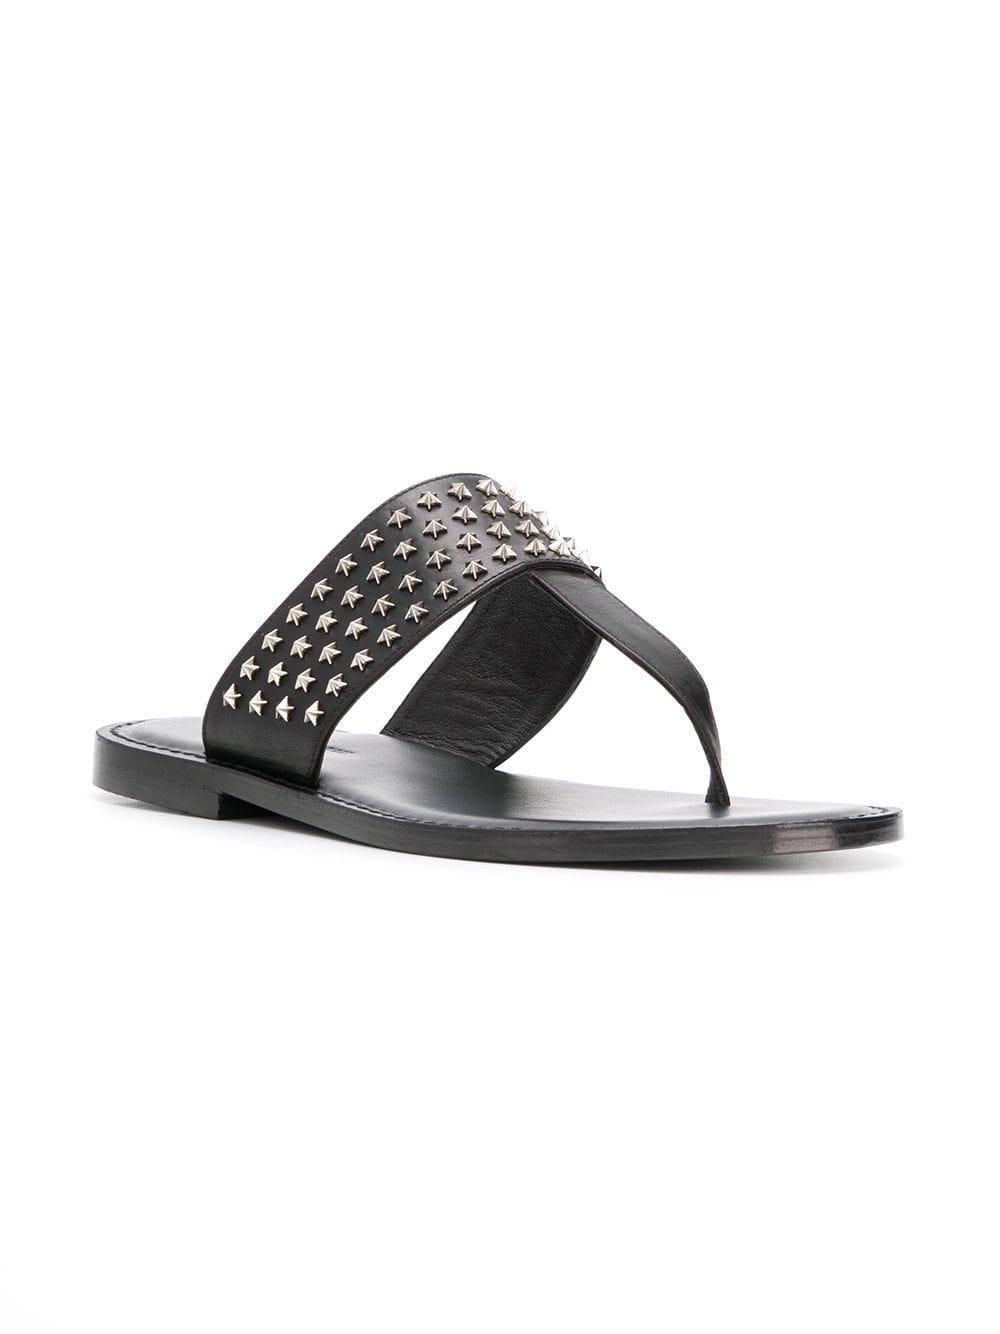 03191e38a0726 ... Black Star Studs Flip-flops for Men - Lyst. View fullscreen